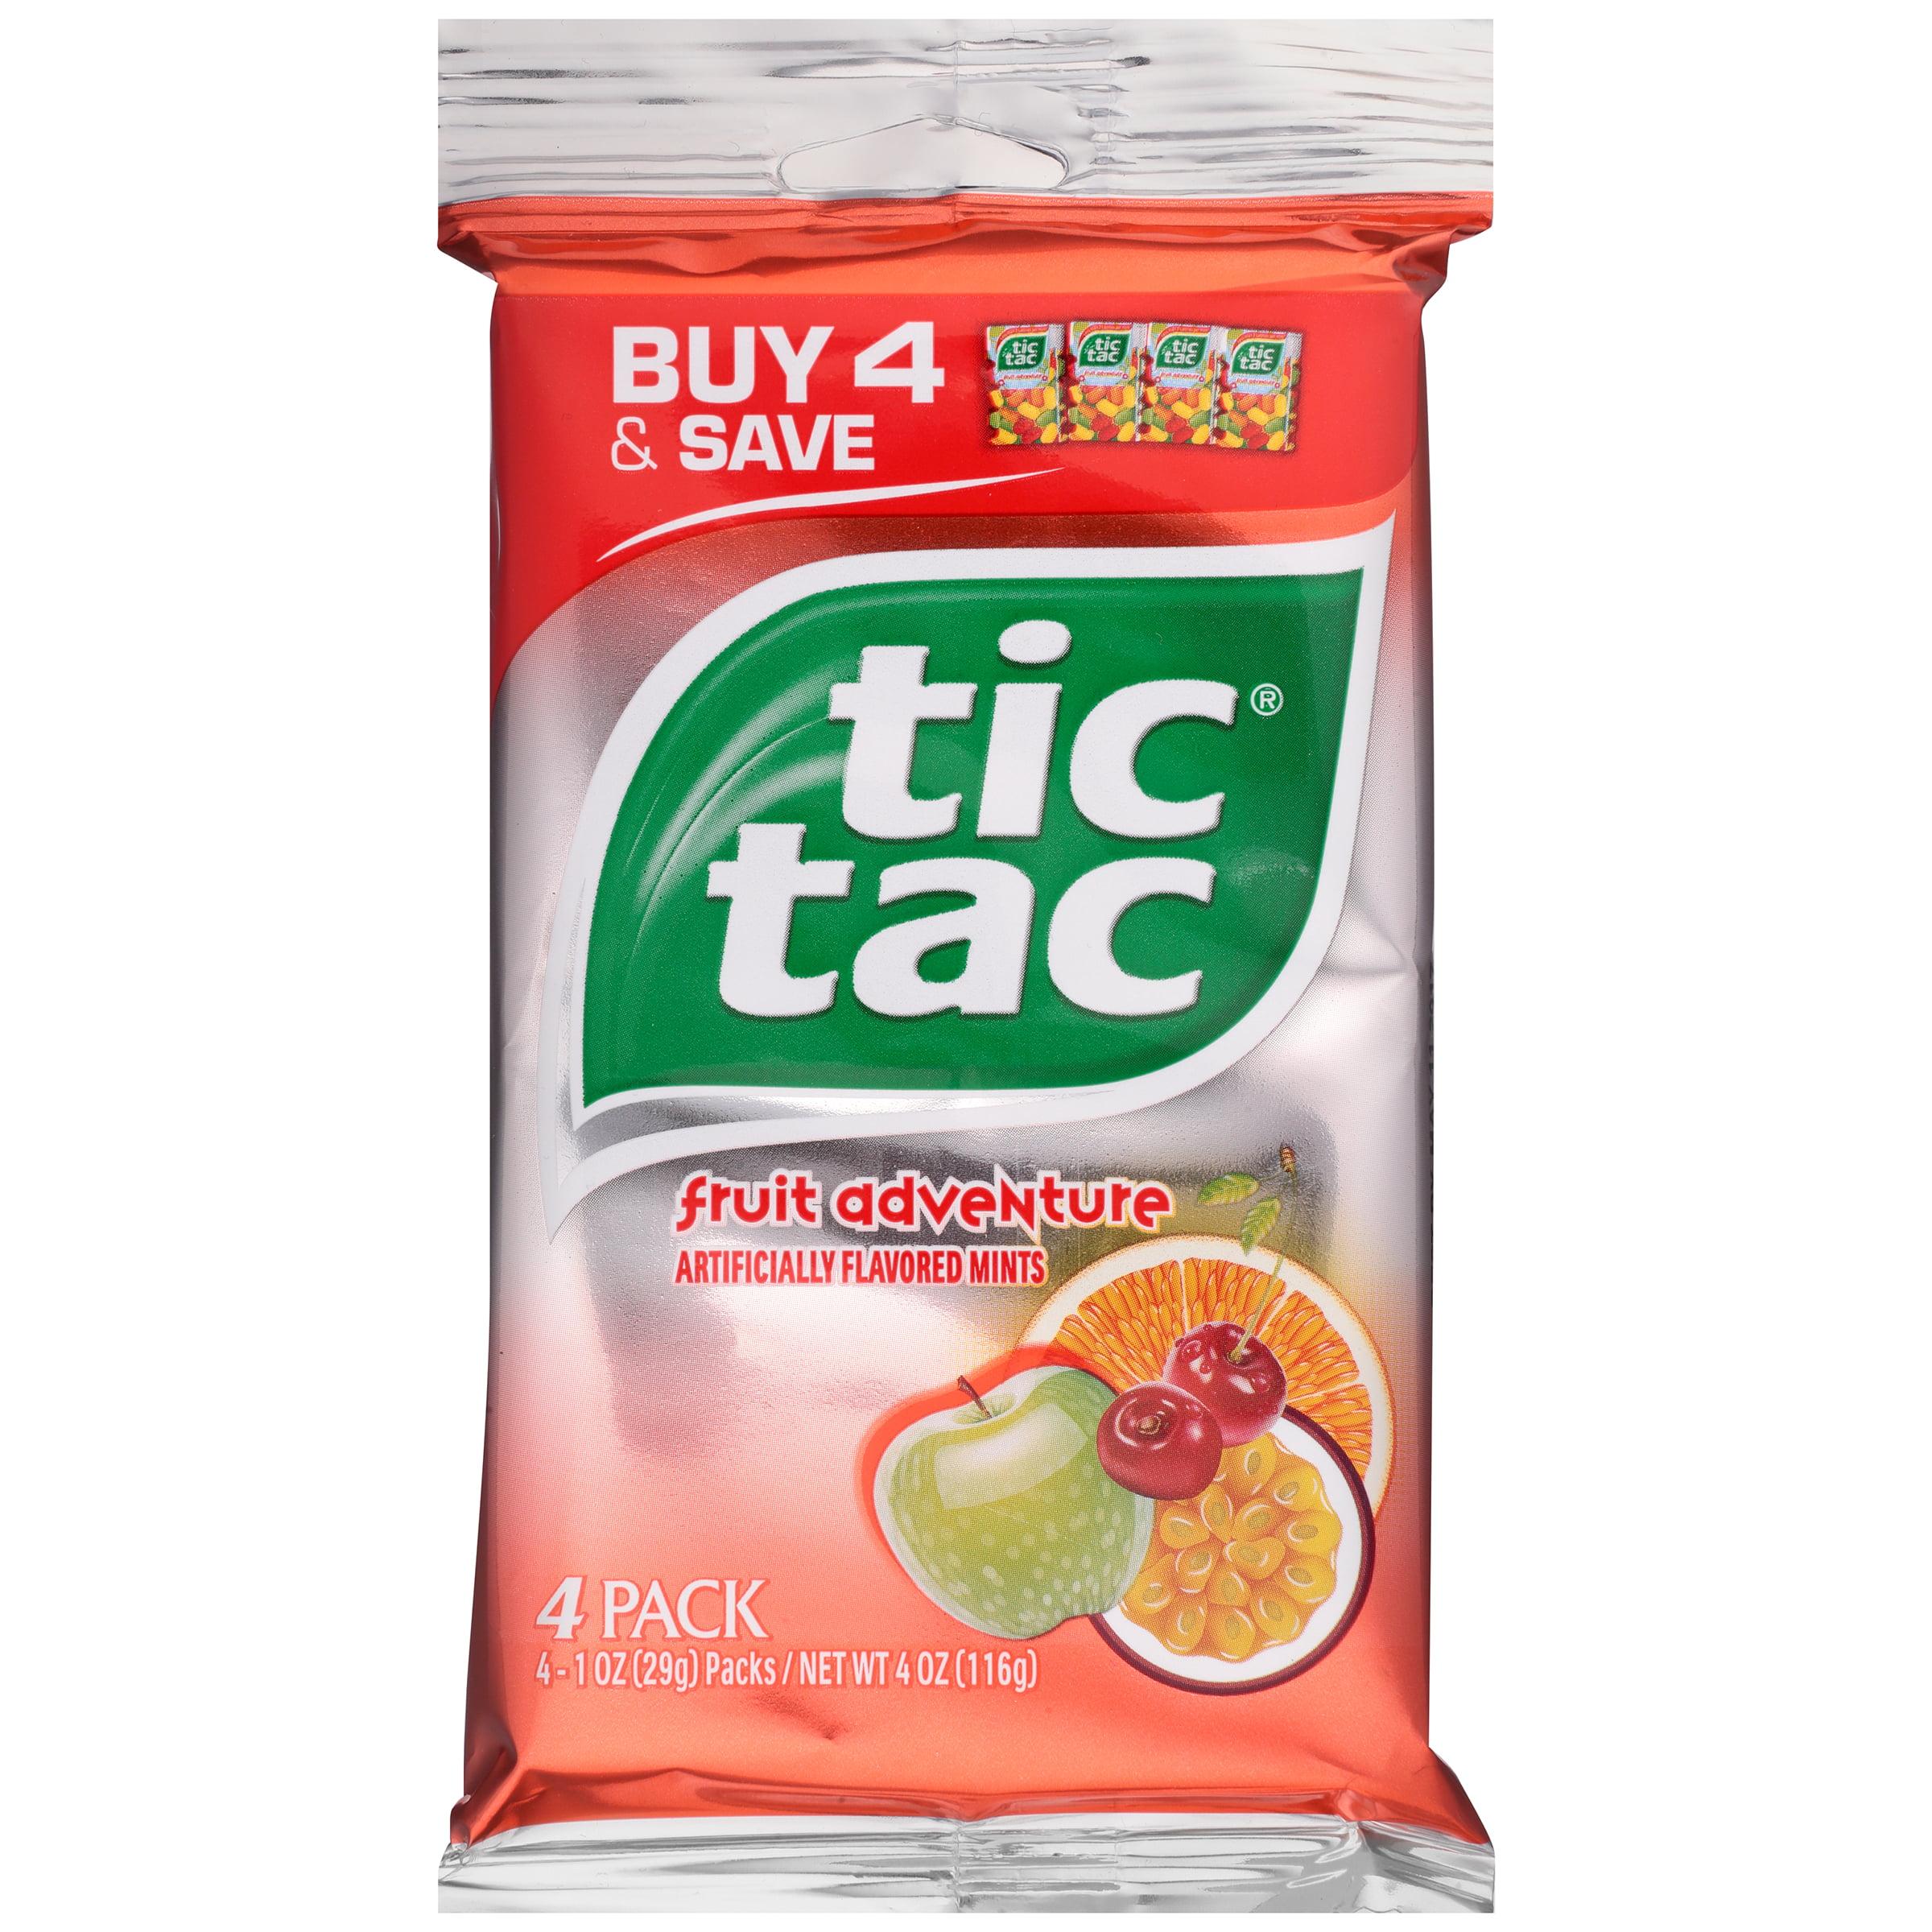 Fruit Adventure Tic Tac Mints 4-1 oz. Packs by Ferrero U.S.A., Inc.